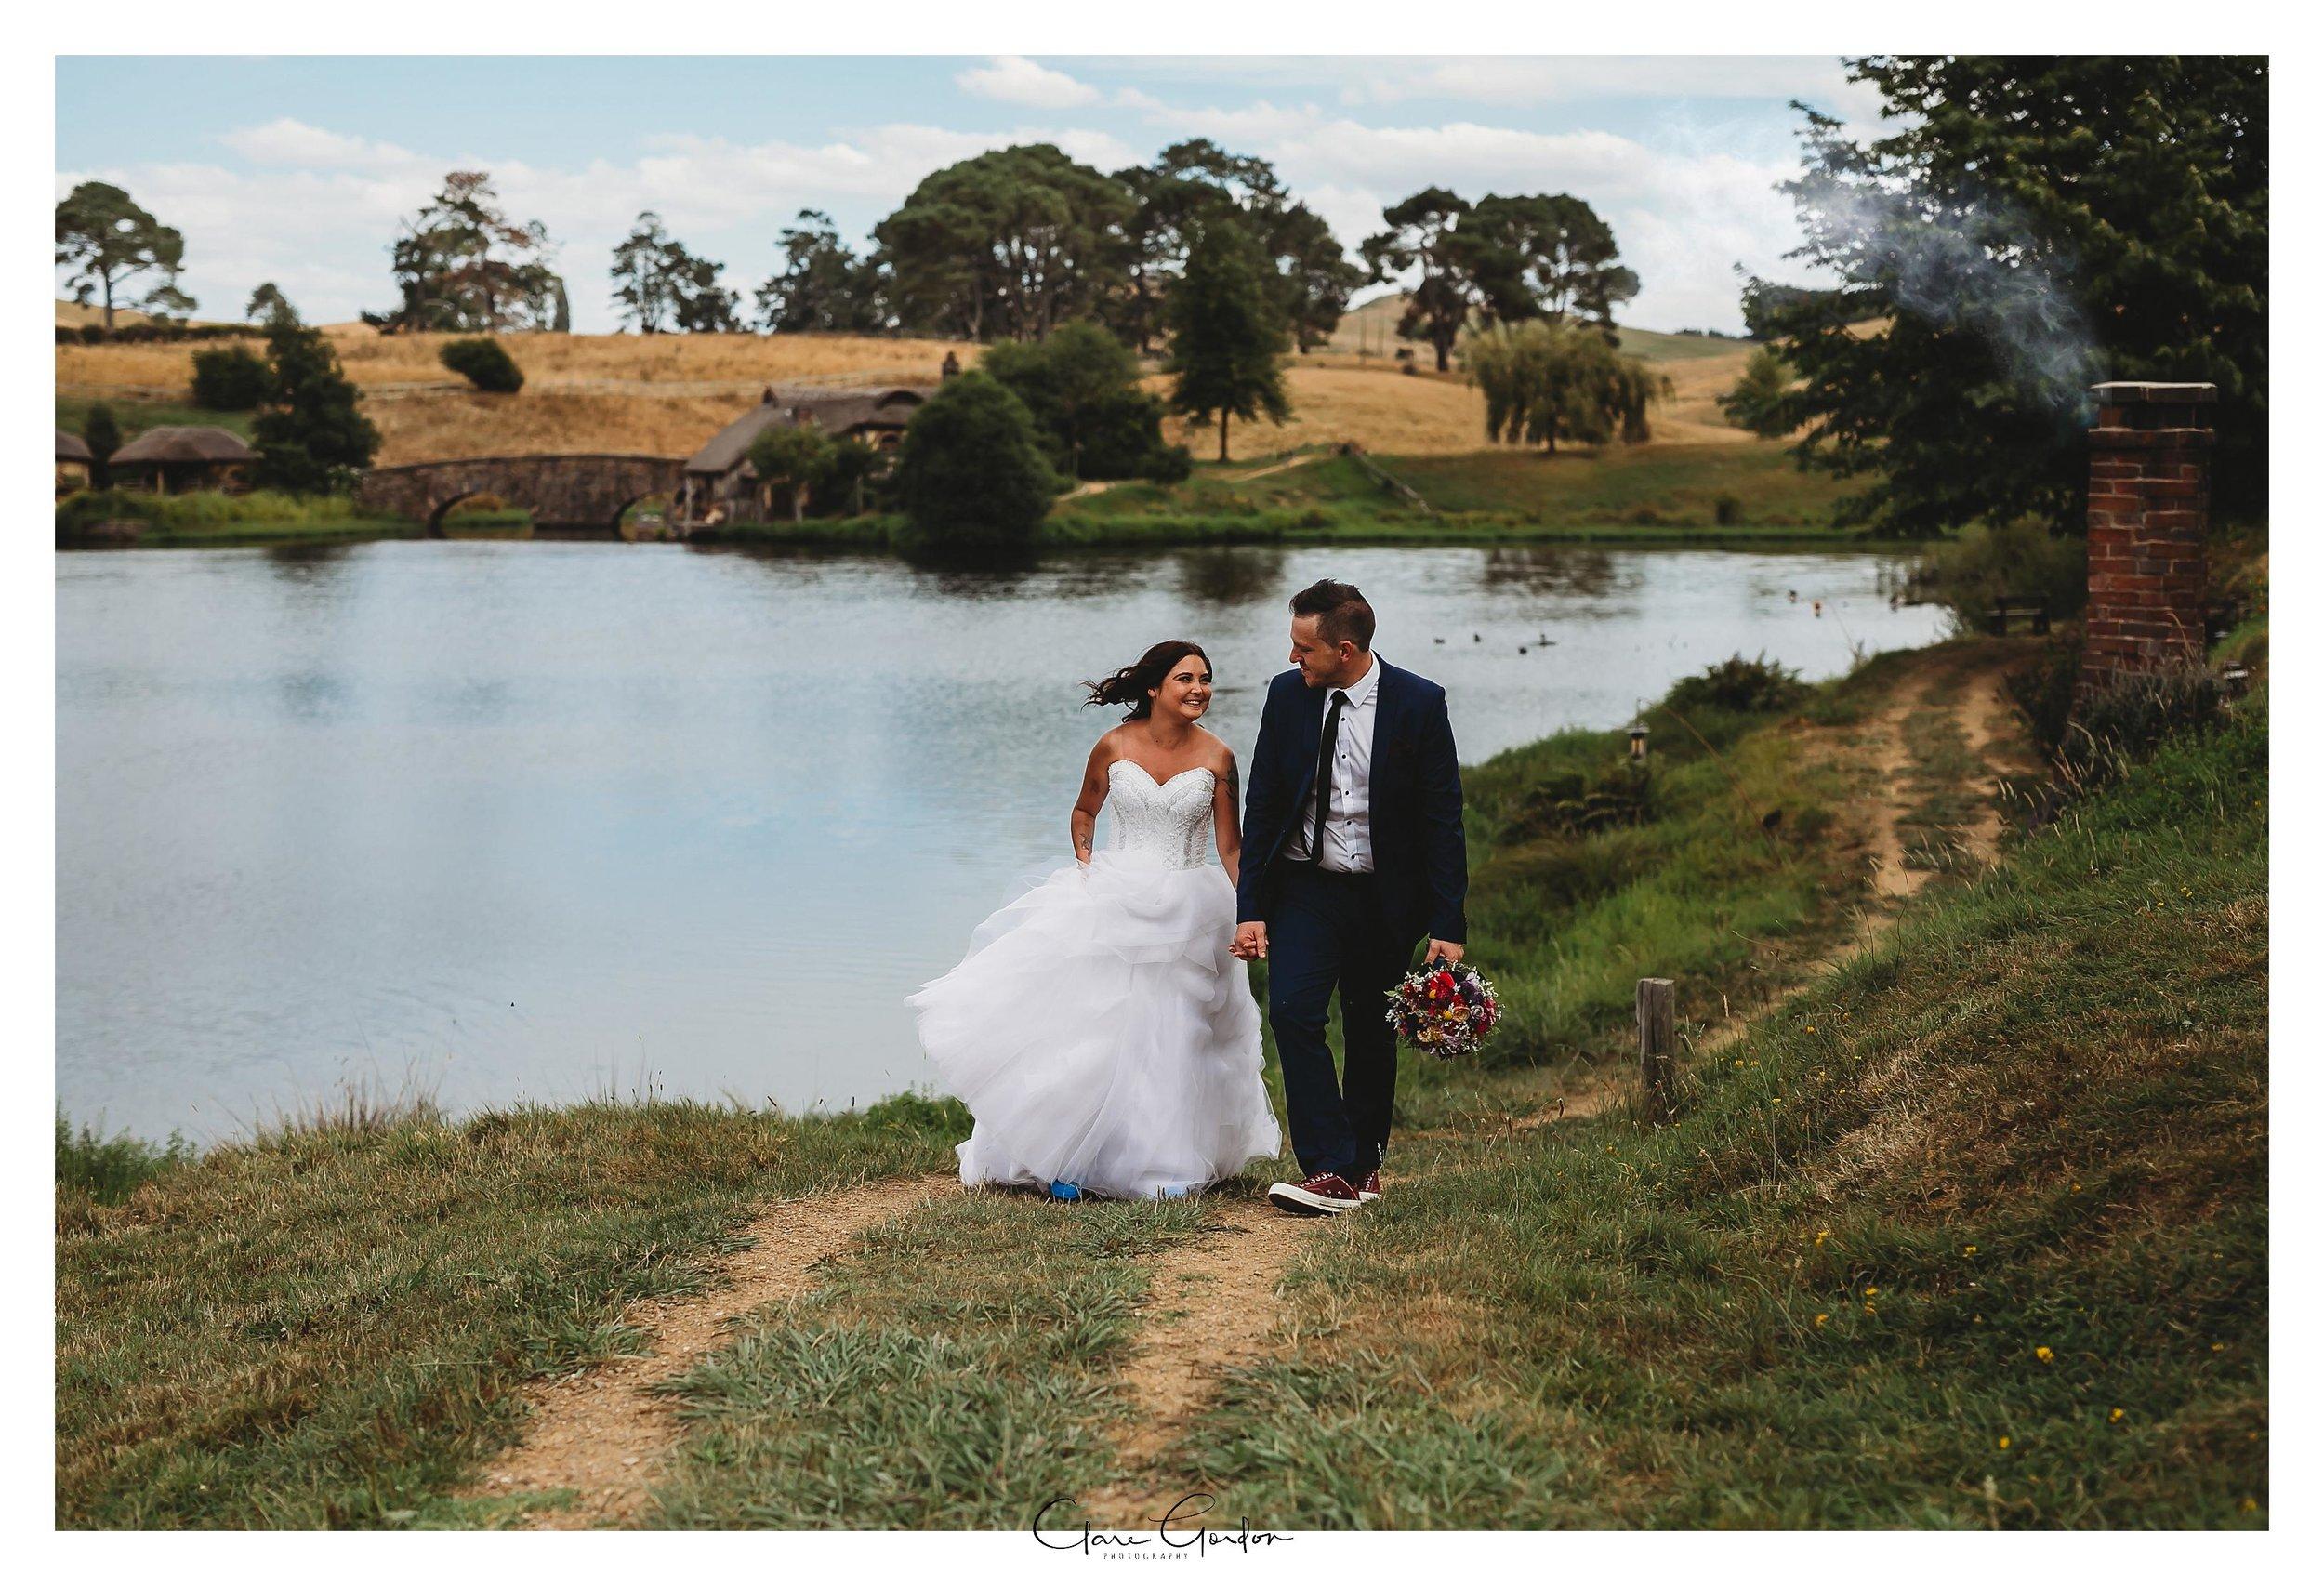 Hobbiton-wedding-photo-Bride-and-groom-Walking-dancing-by-lake (1).jpg